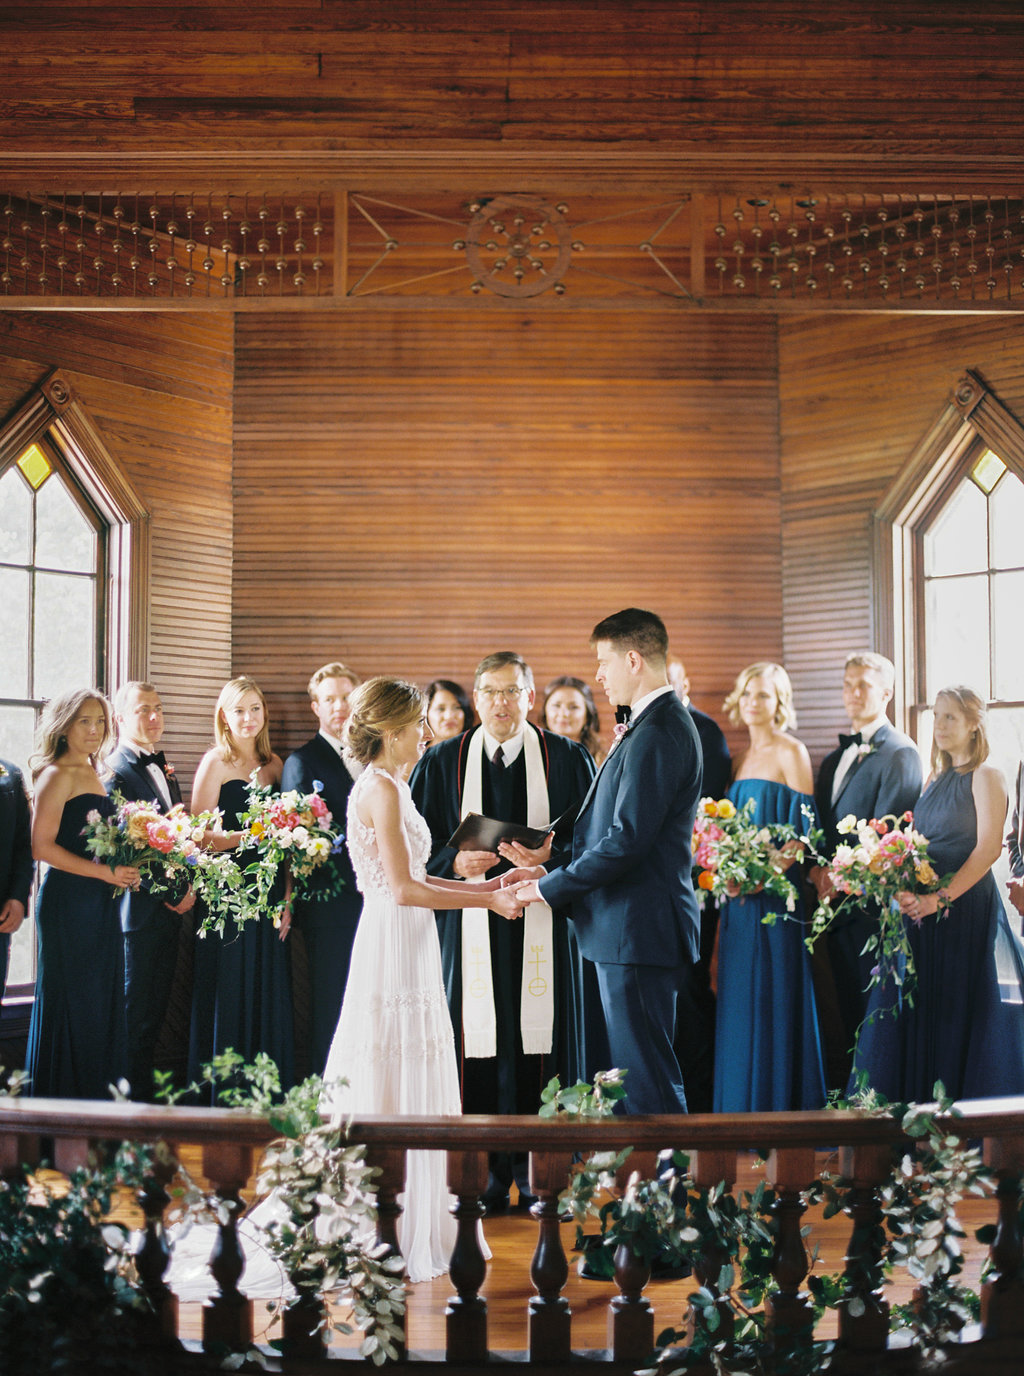 aprylann_wedding_448.jpg